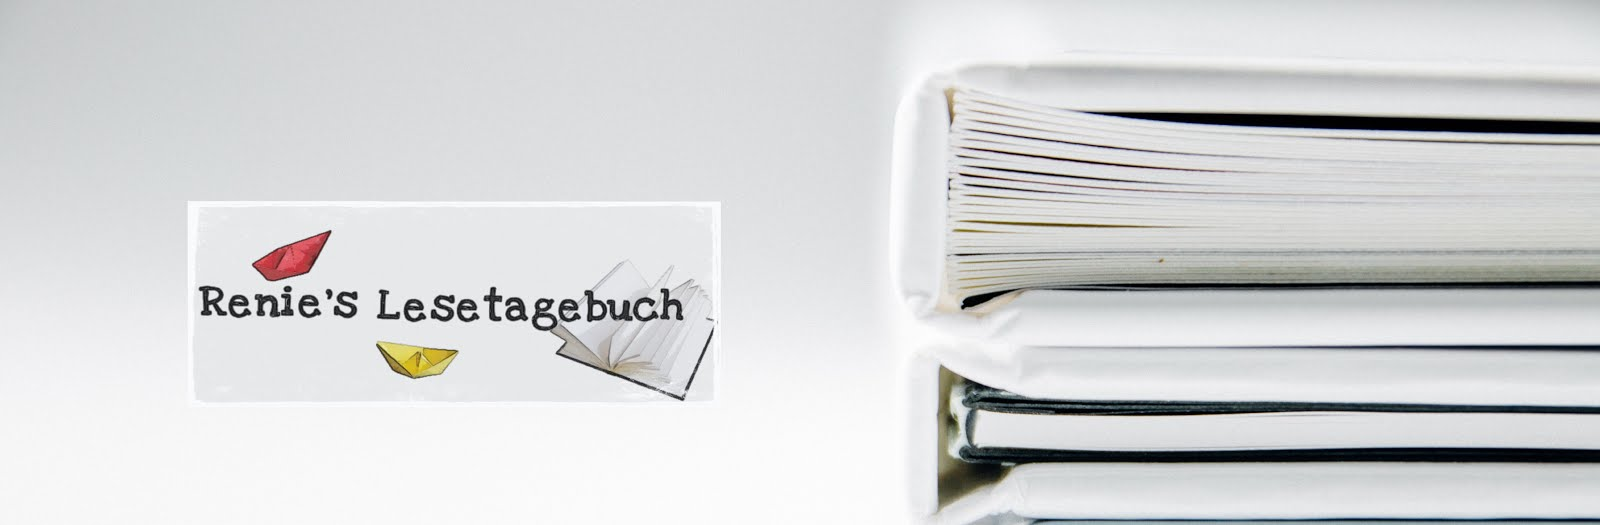 Renie's Lesetagebuch